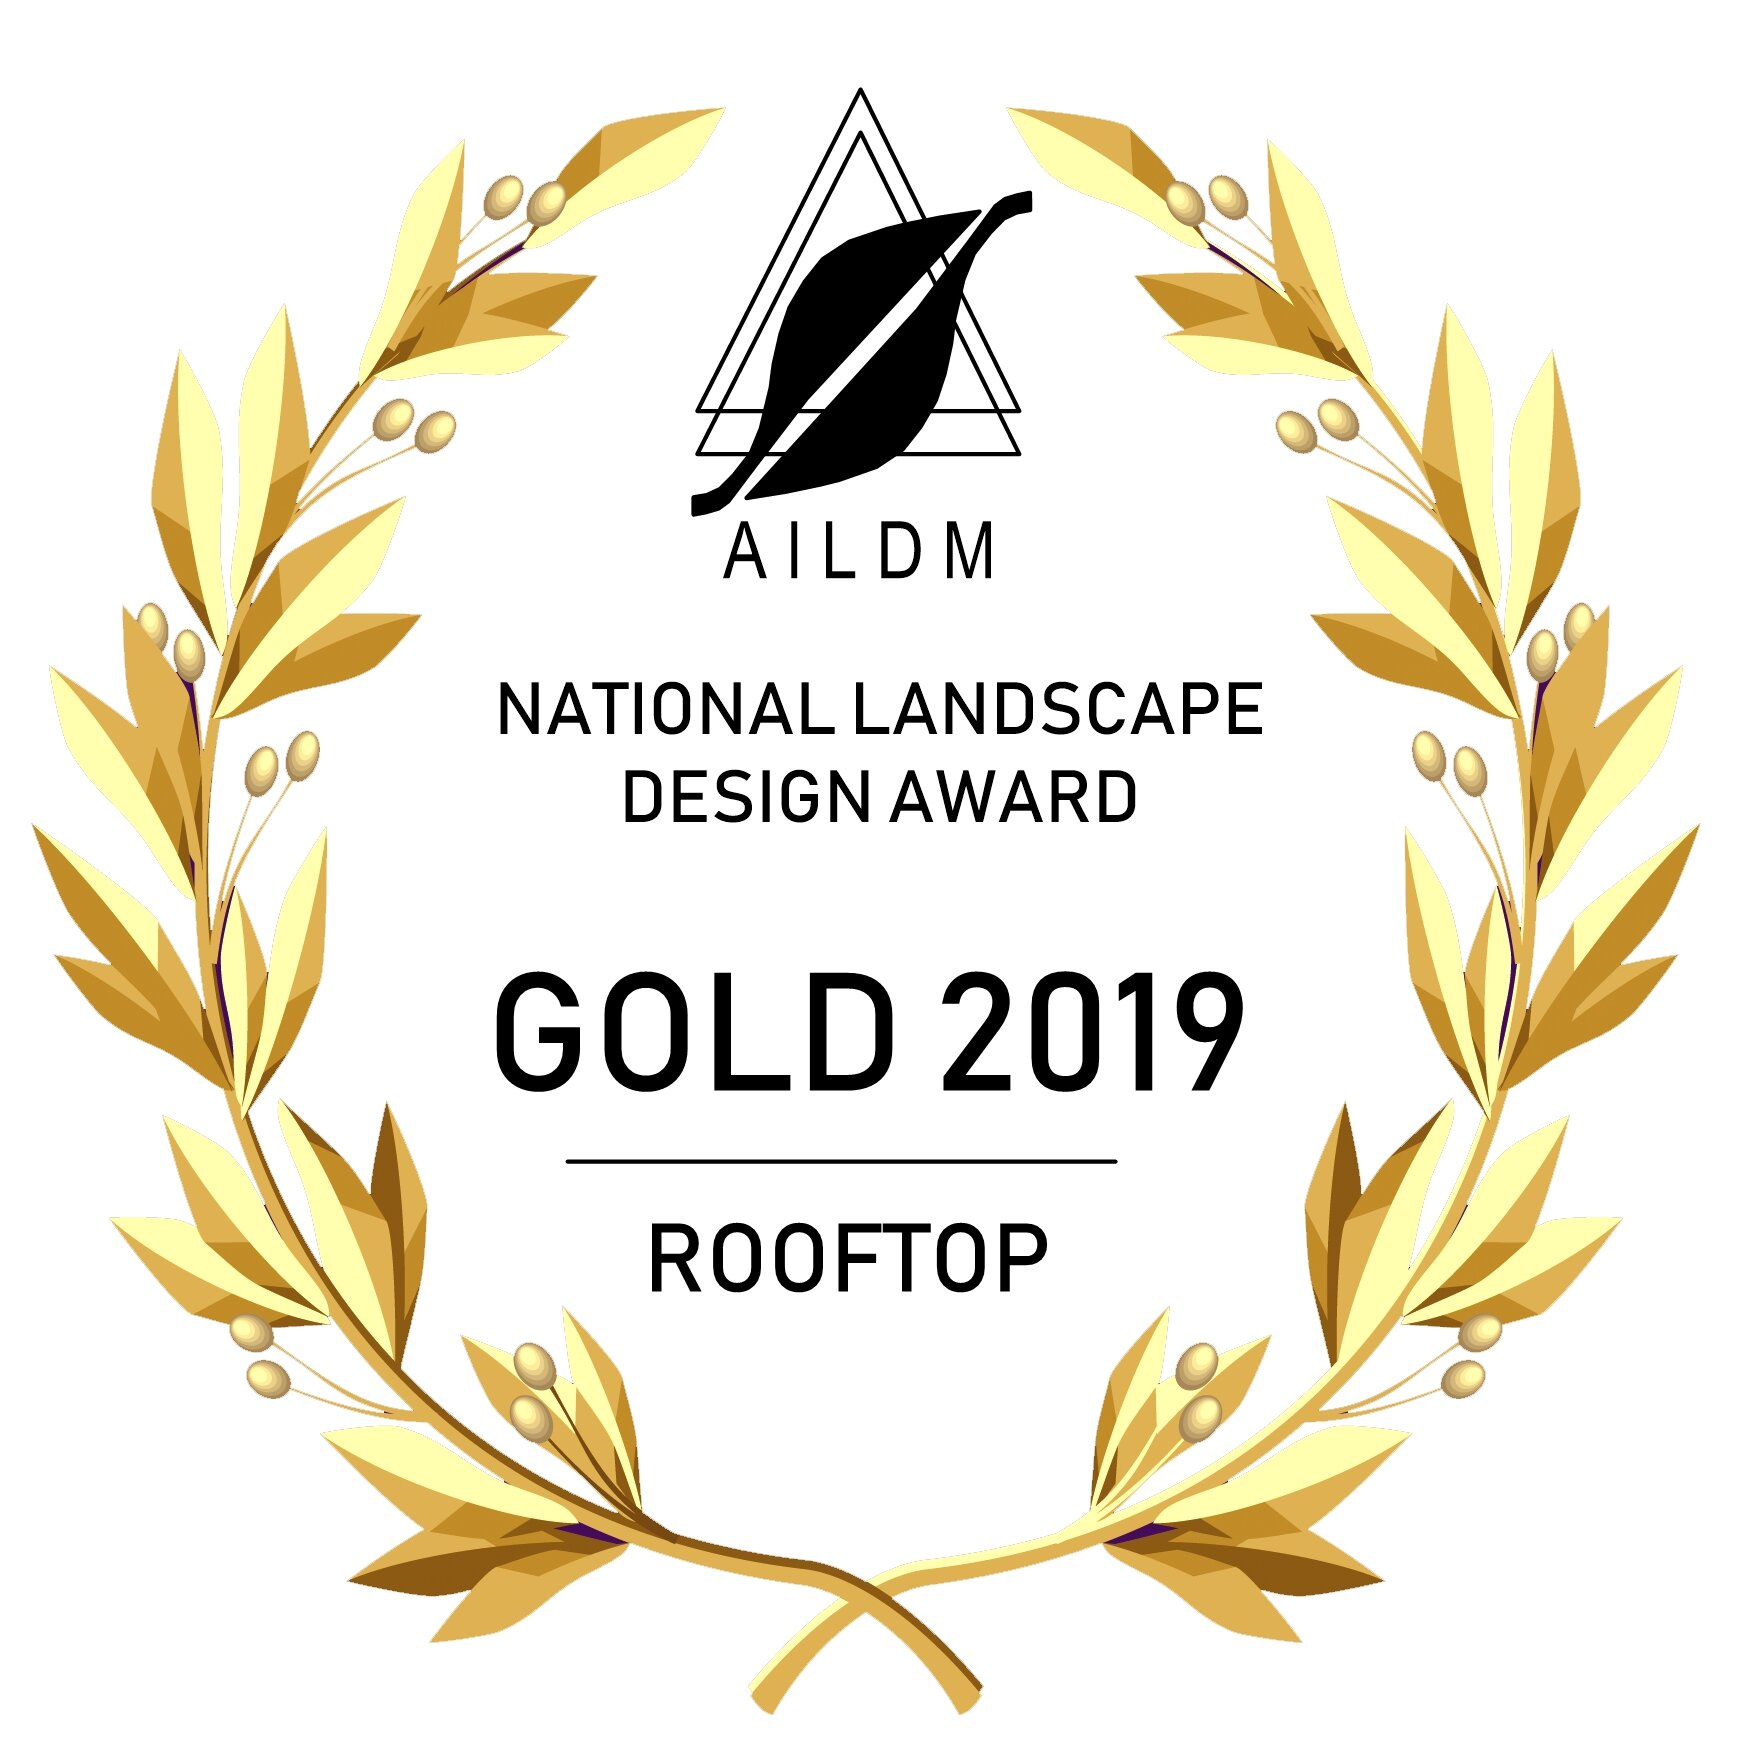 AILDM 2019 MEDAL ICON GOLD.jpg